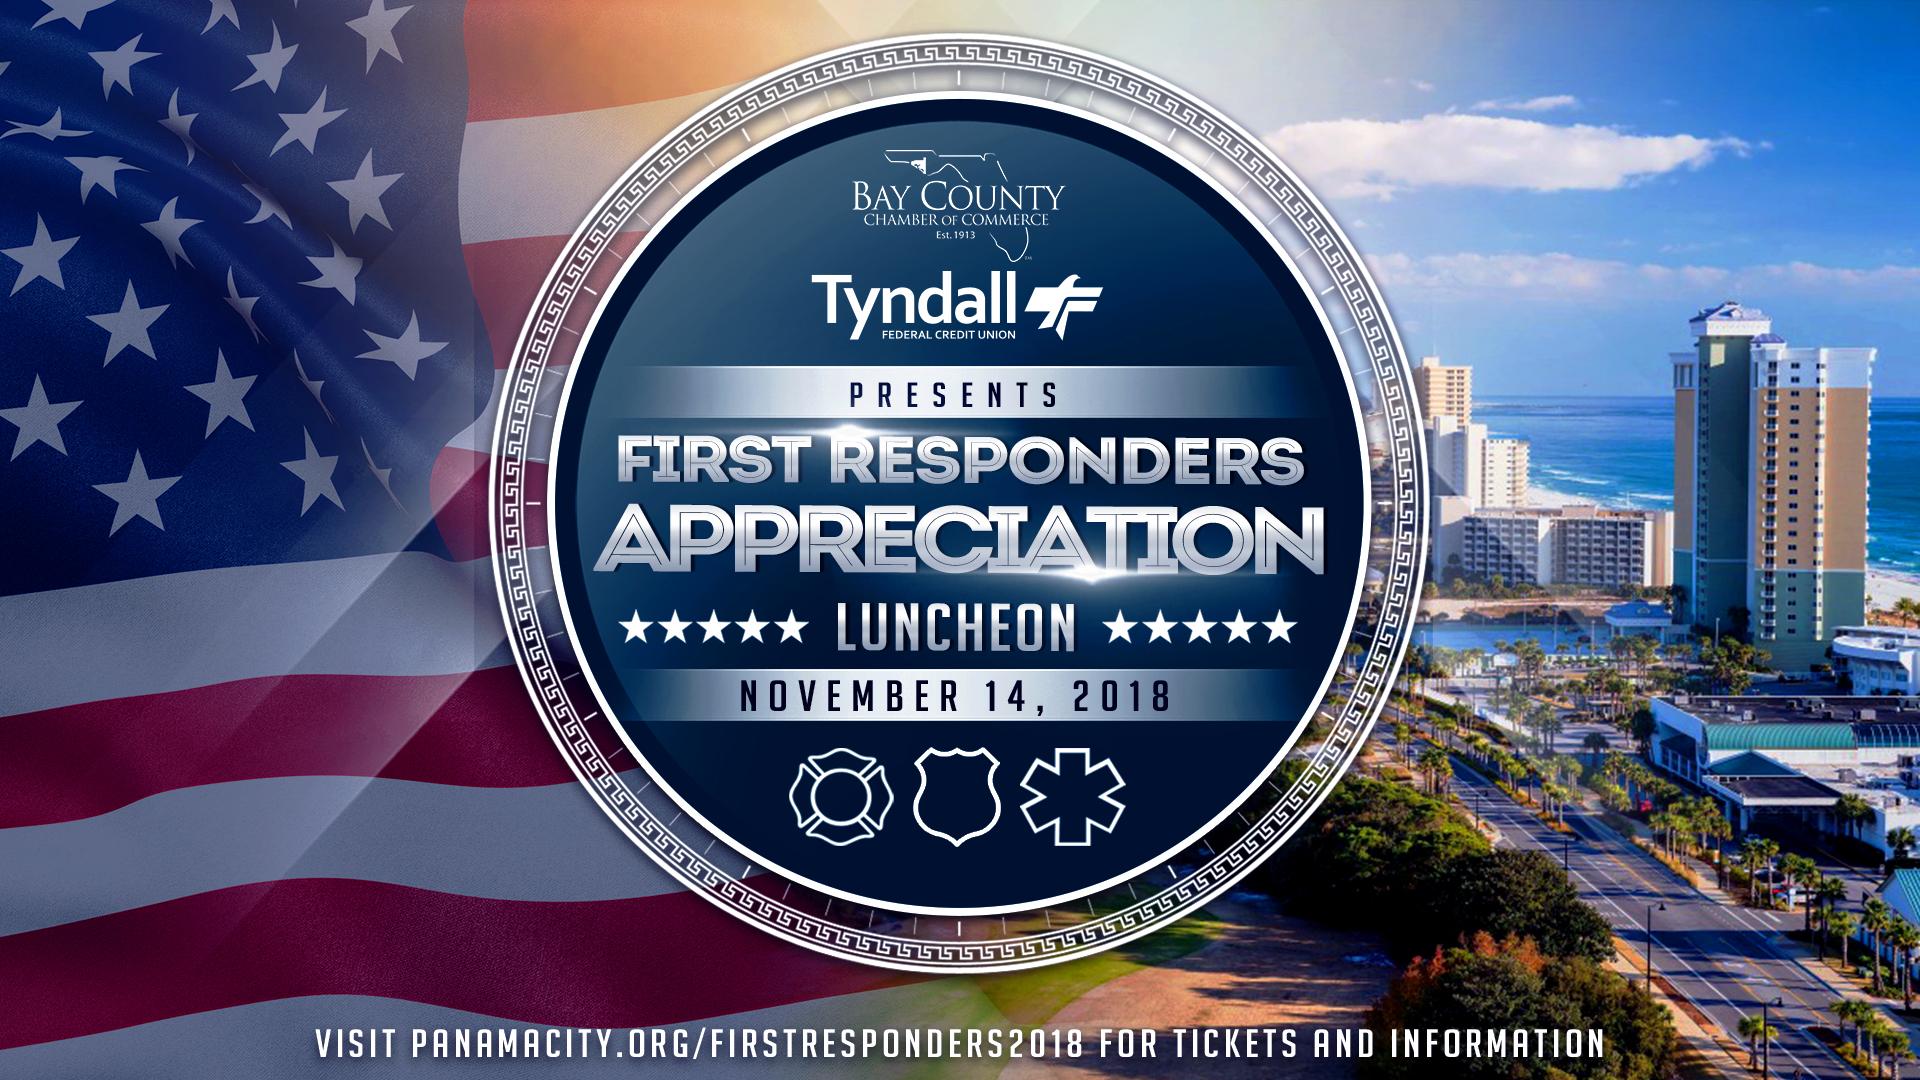 2018 First Responders Appreciation Luncheon